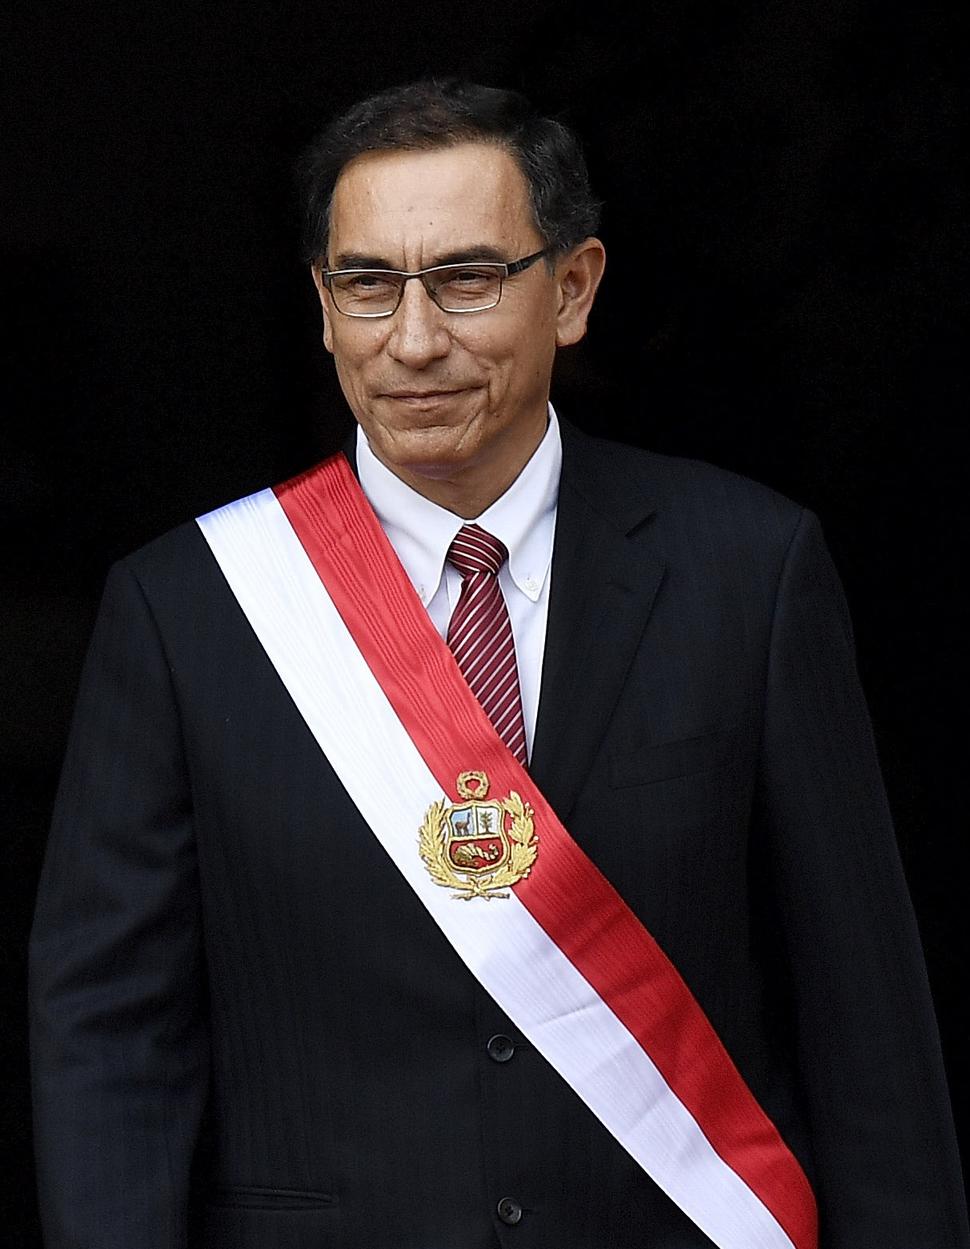 Mart%C3%ADn Vizcarra Cornejo (cropped)